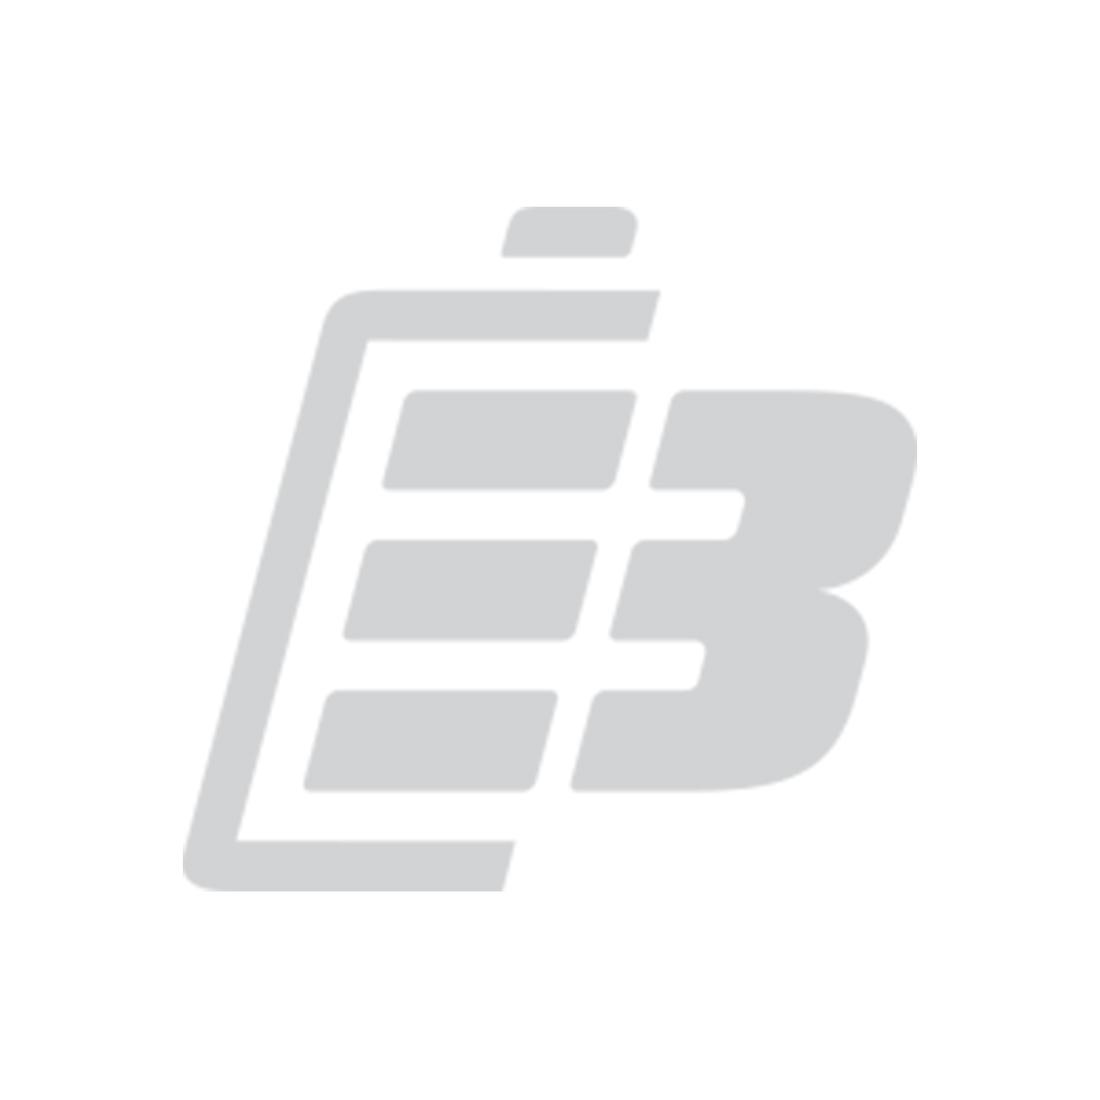 Smartphone battery Lenovo A936_1